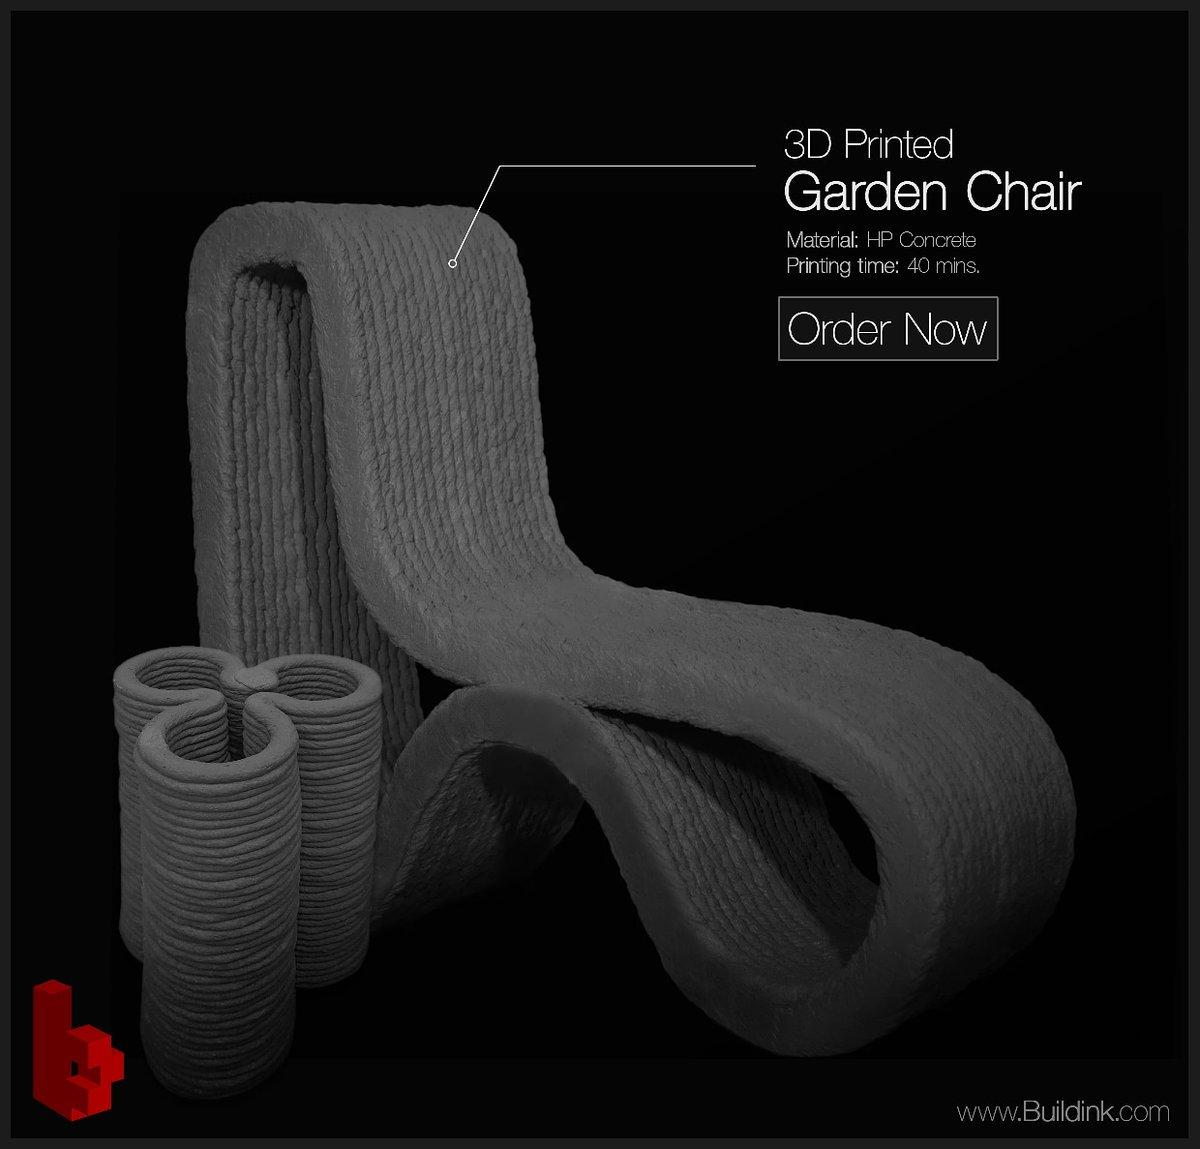 #3D #Concrete #Print custom #furniture in less than 1 hour! Starting from $20.  #digitalfabrication #3dconcreteprinting #3dcp #advanced #industry #manufacturing #structure #robotics #beton #interiordesign #architecture #additivemanufacturing #art #digital #fabrication #dubaipic.twitter.com/EbV8uH0hpR